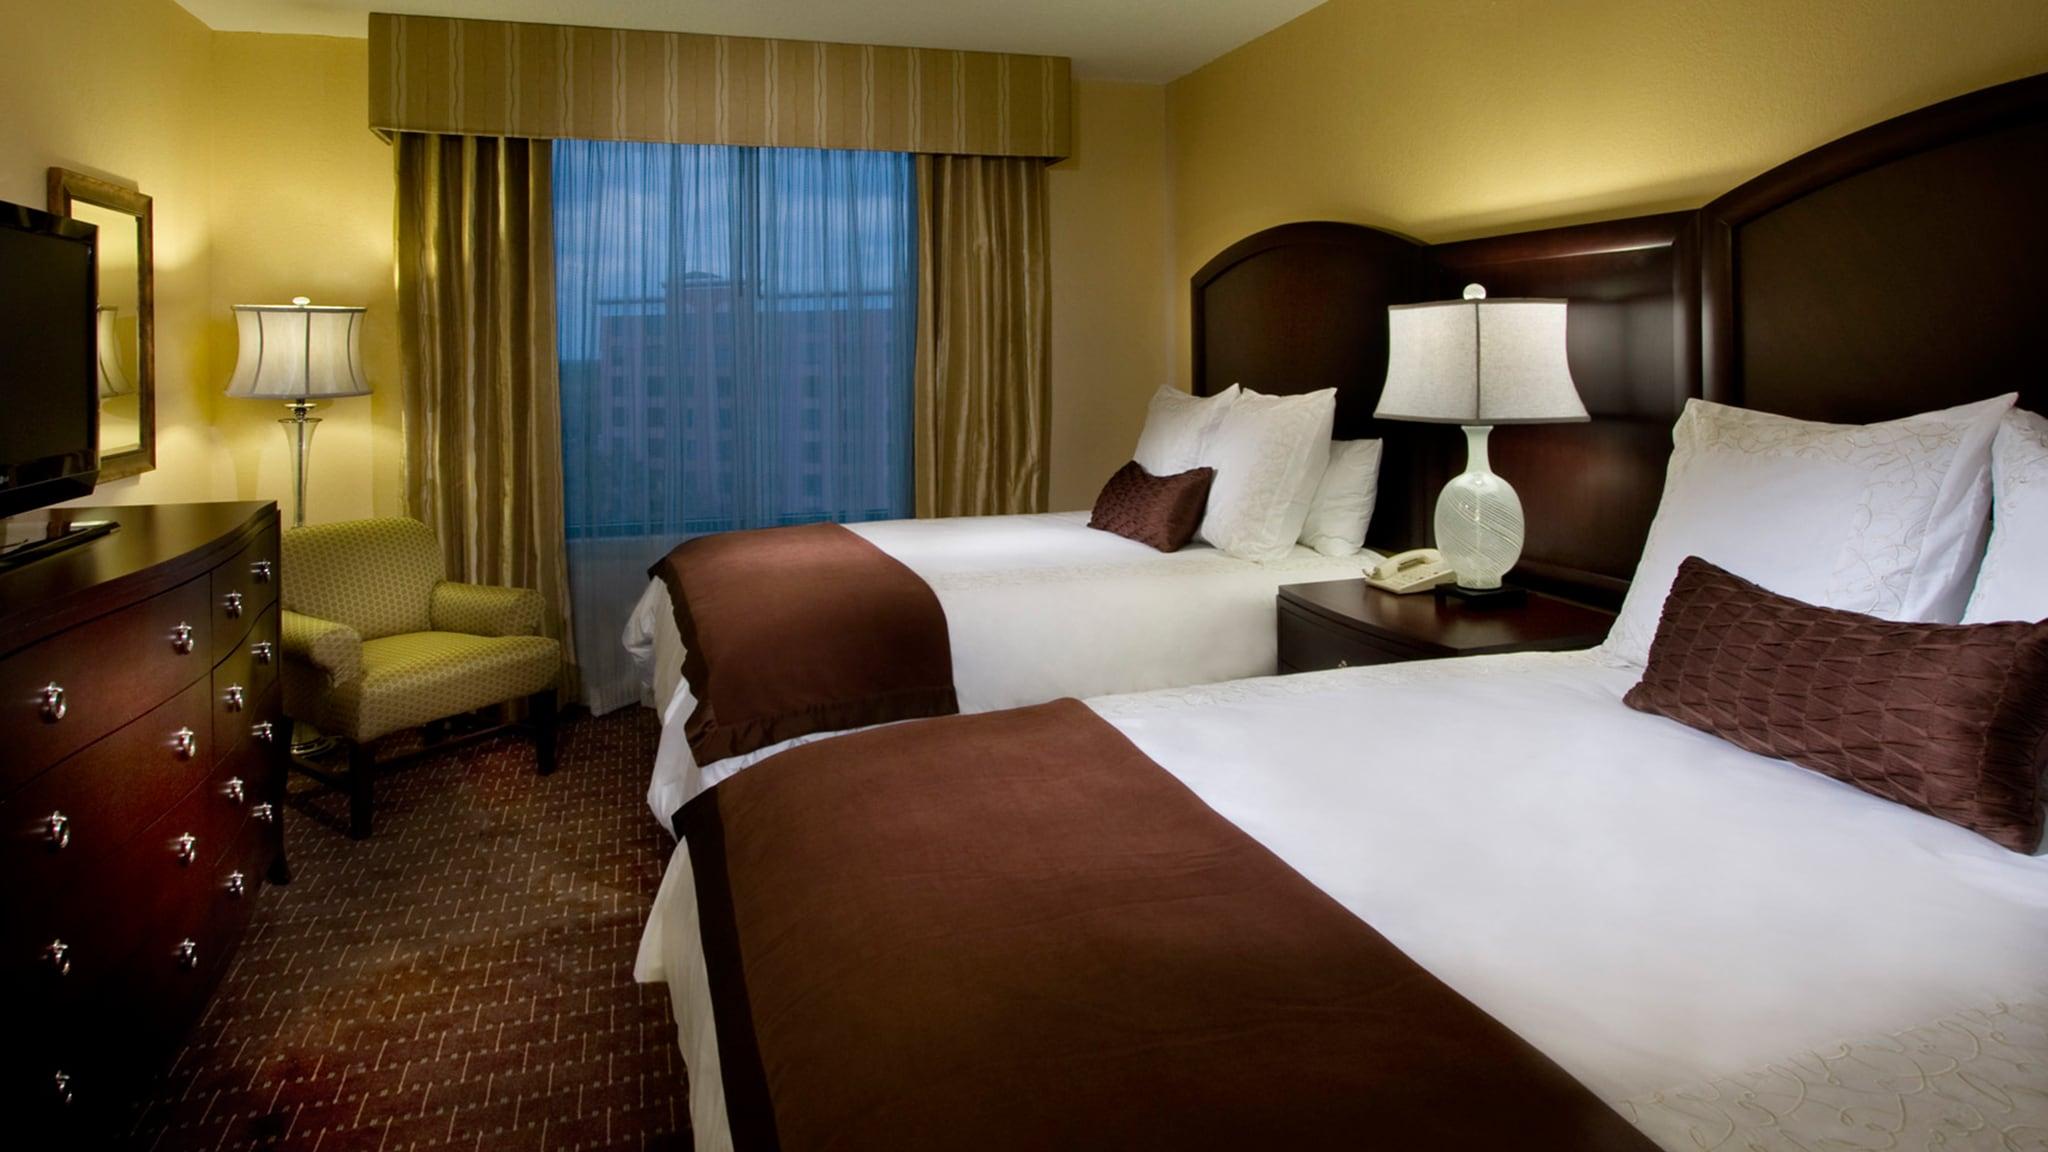 2 bedroom suite hotels in orlando florida home plan for Orlando two bedroom suite hotels